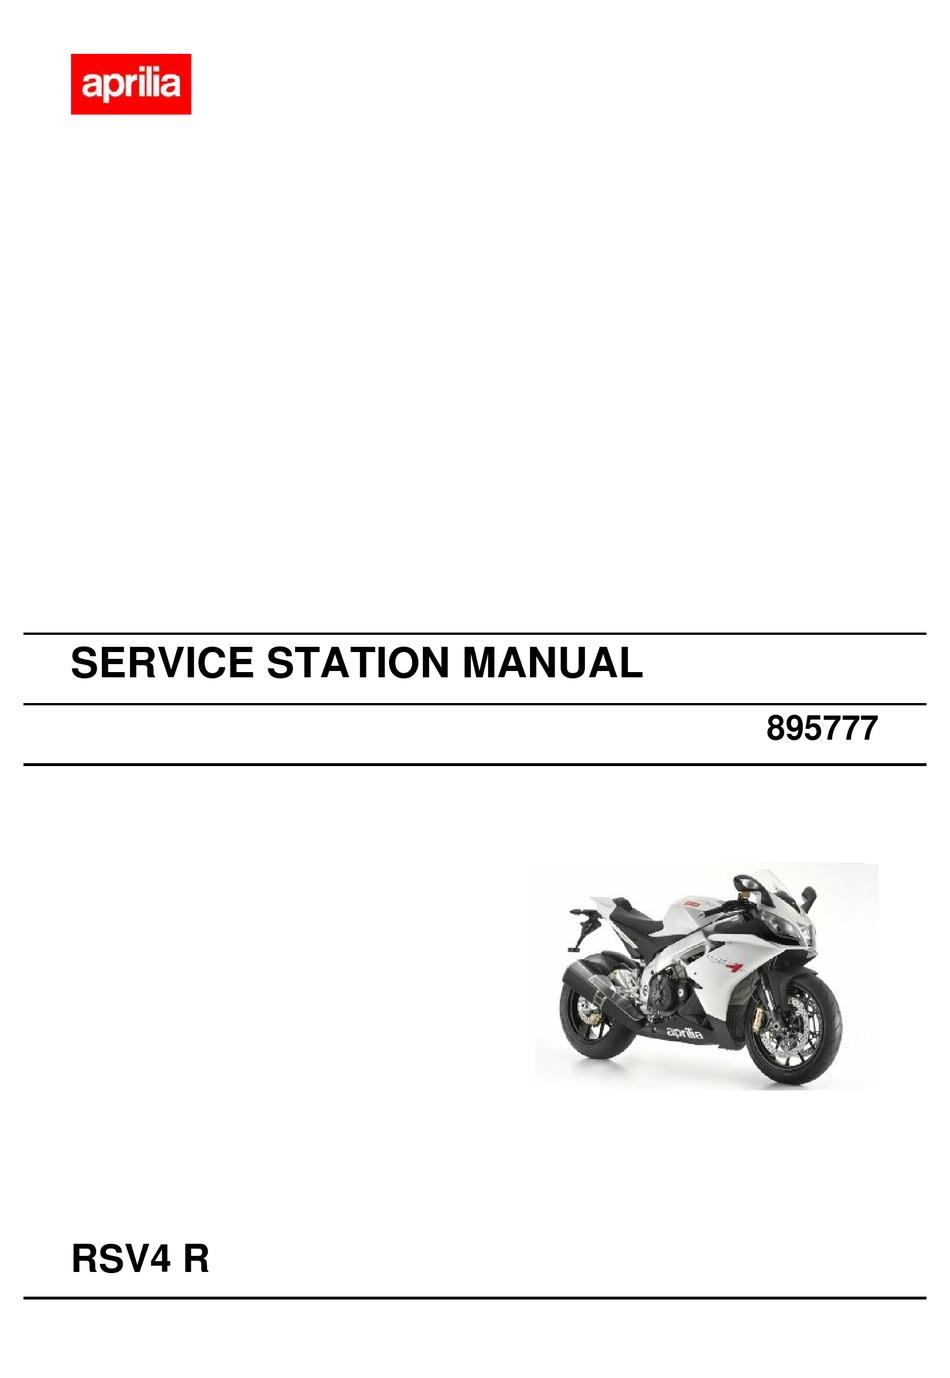 Aprilia Rsv4 R Service Station Manual Pdf Download Manualslib